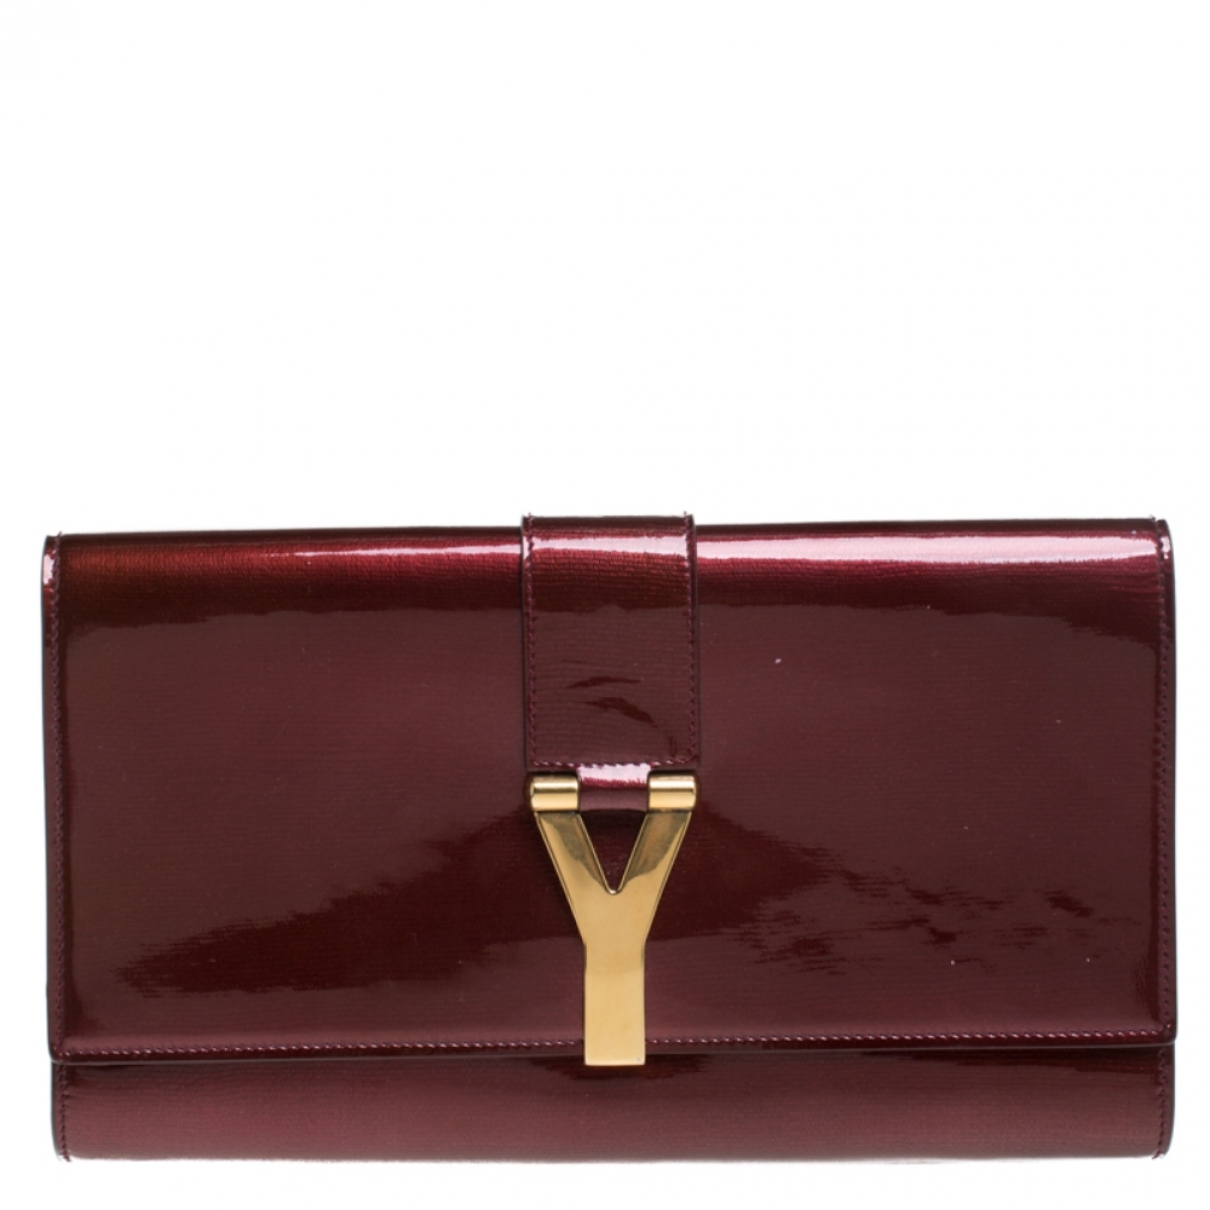 Saint Laurent Chyc Burgundy Patent leather Clutch bag for Women \N